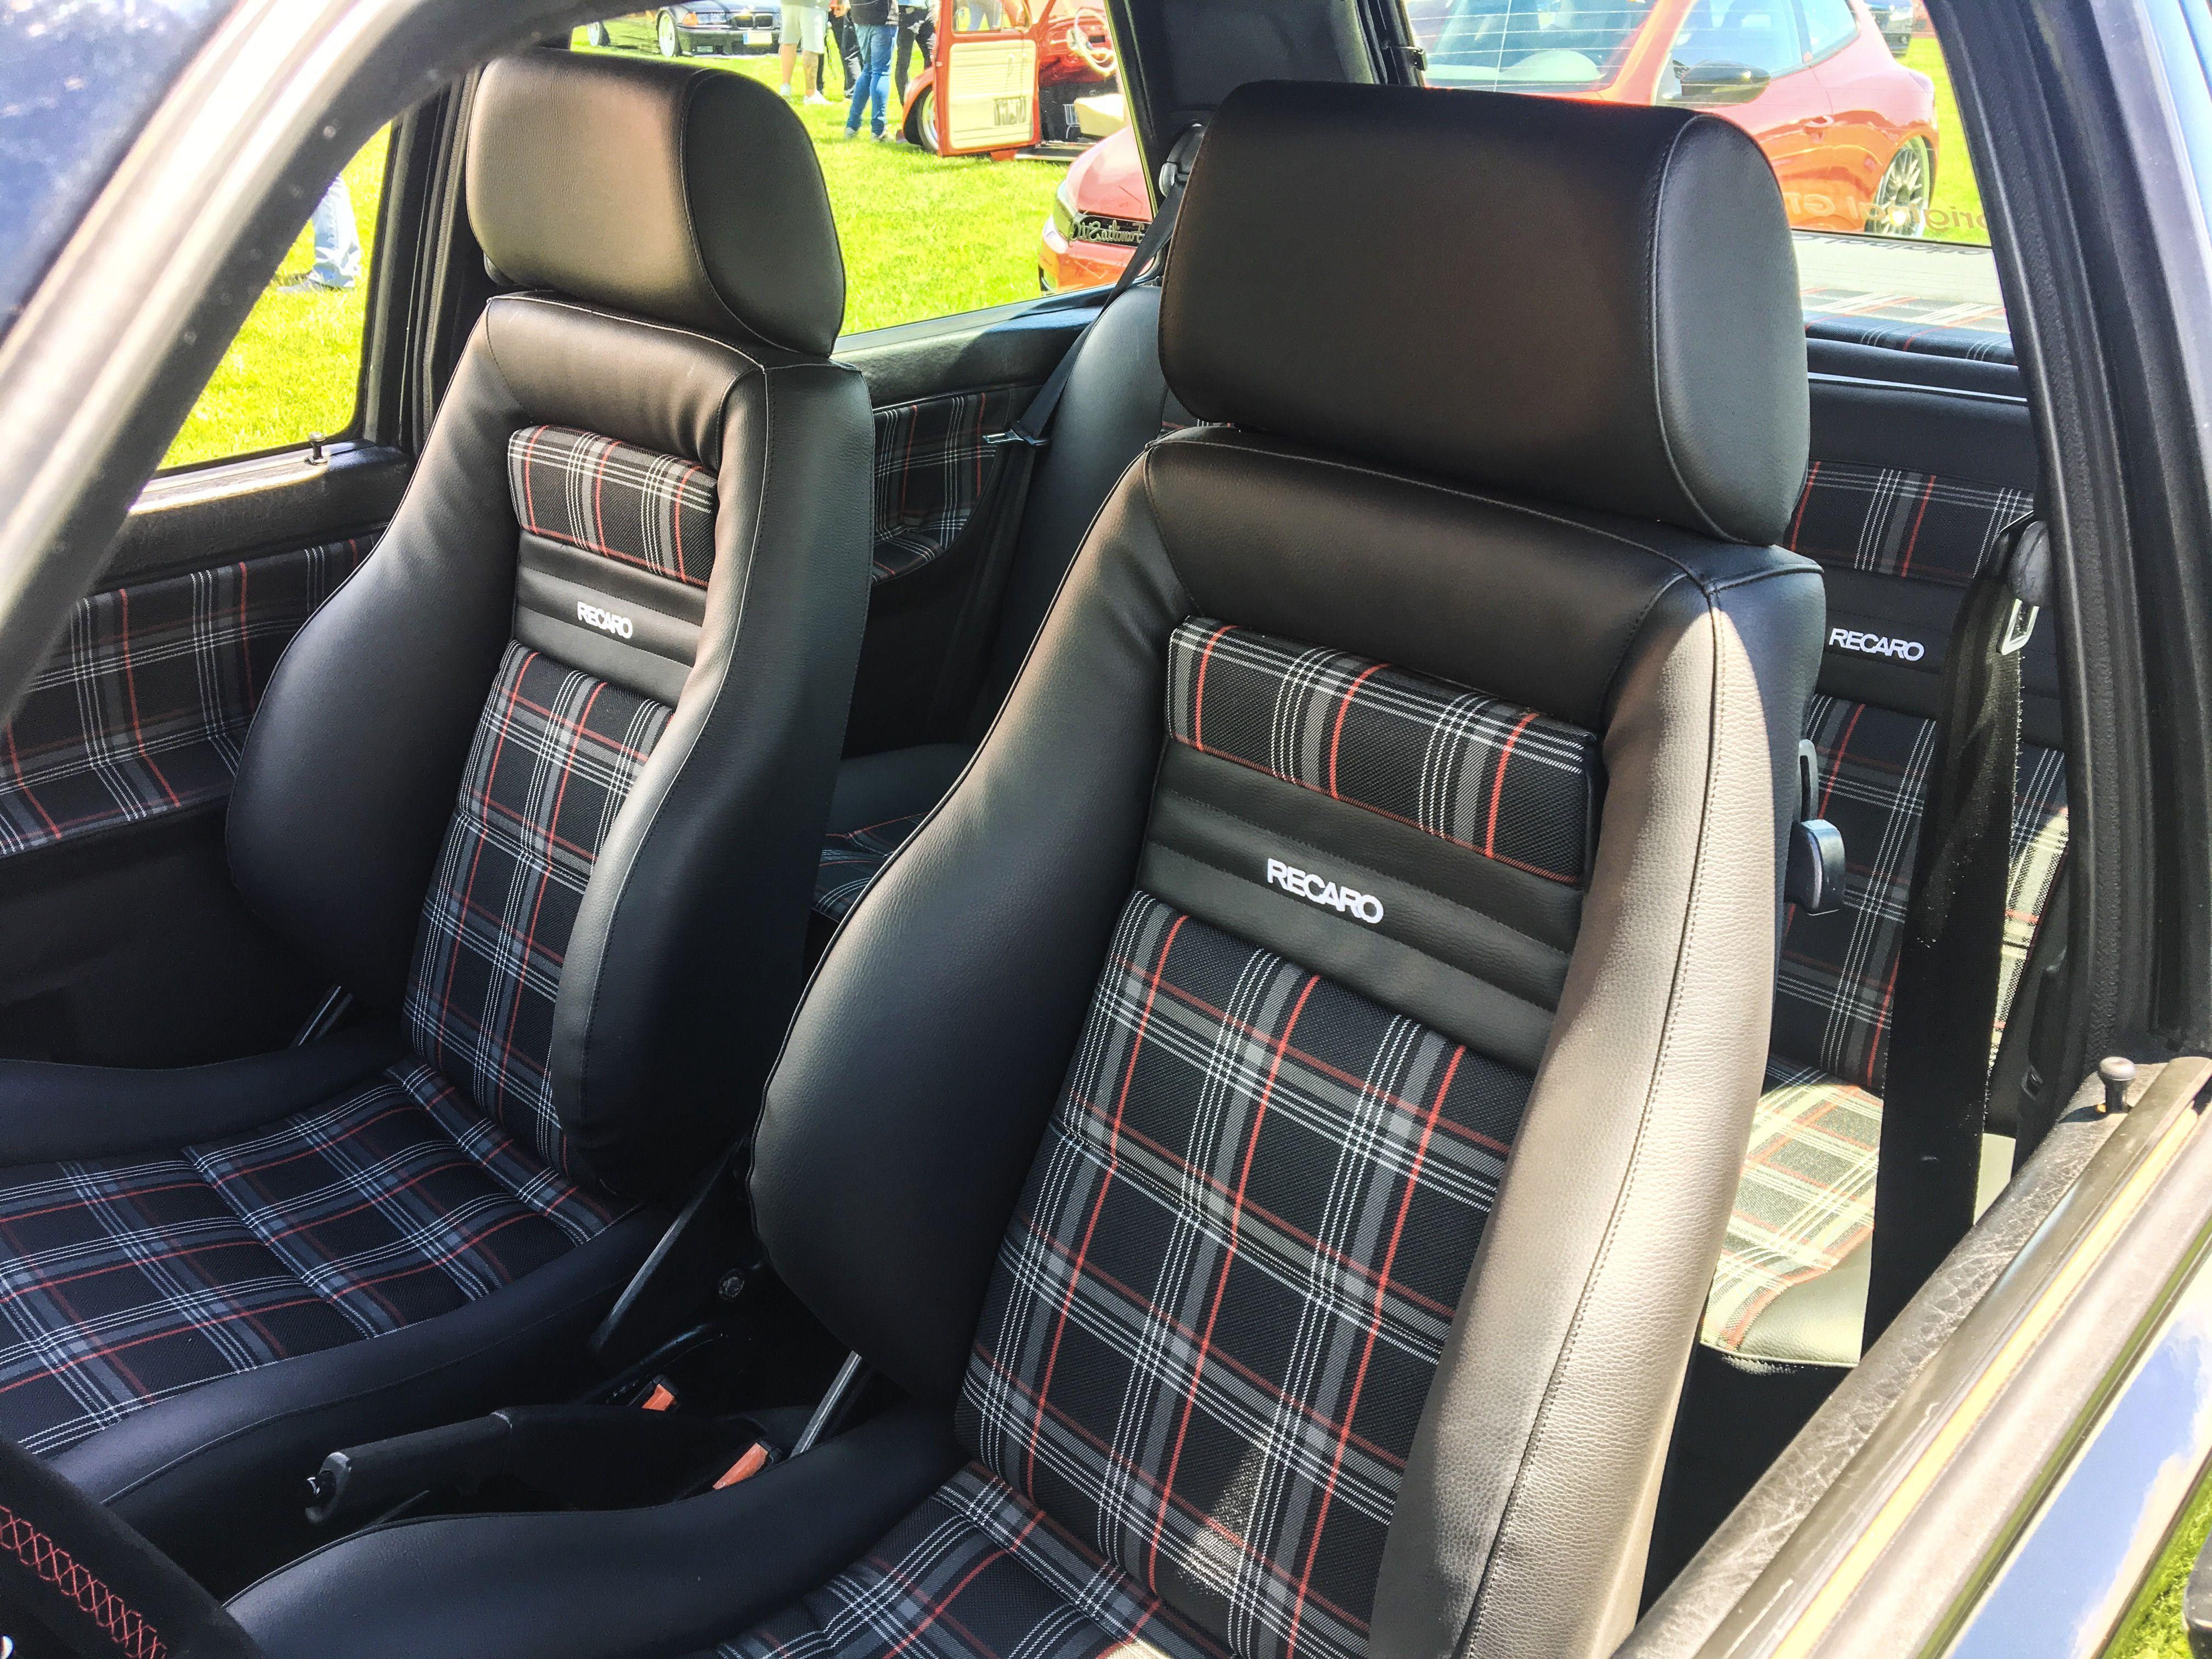 Vw Golf Mk2 Gti Interior Recaro Retapizado Tela Mk7 Gti Arabalar